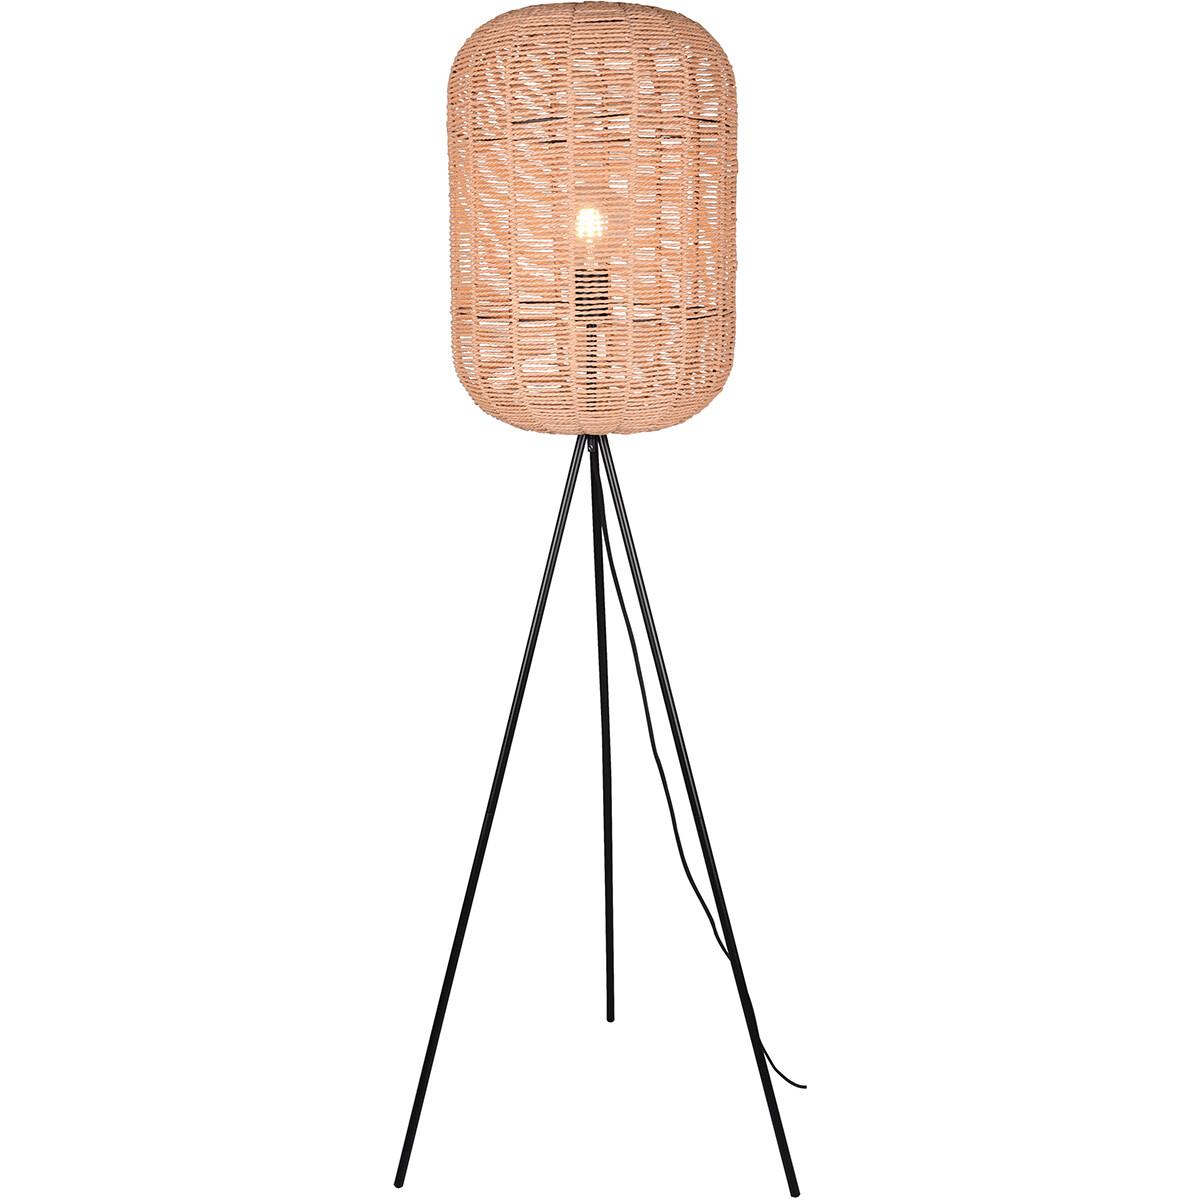 LED Vloerlamp - Trion Tuna - E27 Fitting - Rond - Mat Nikkel - Aluminium